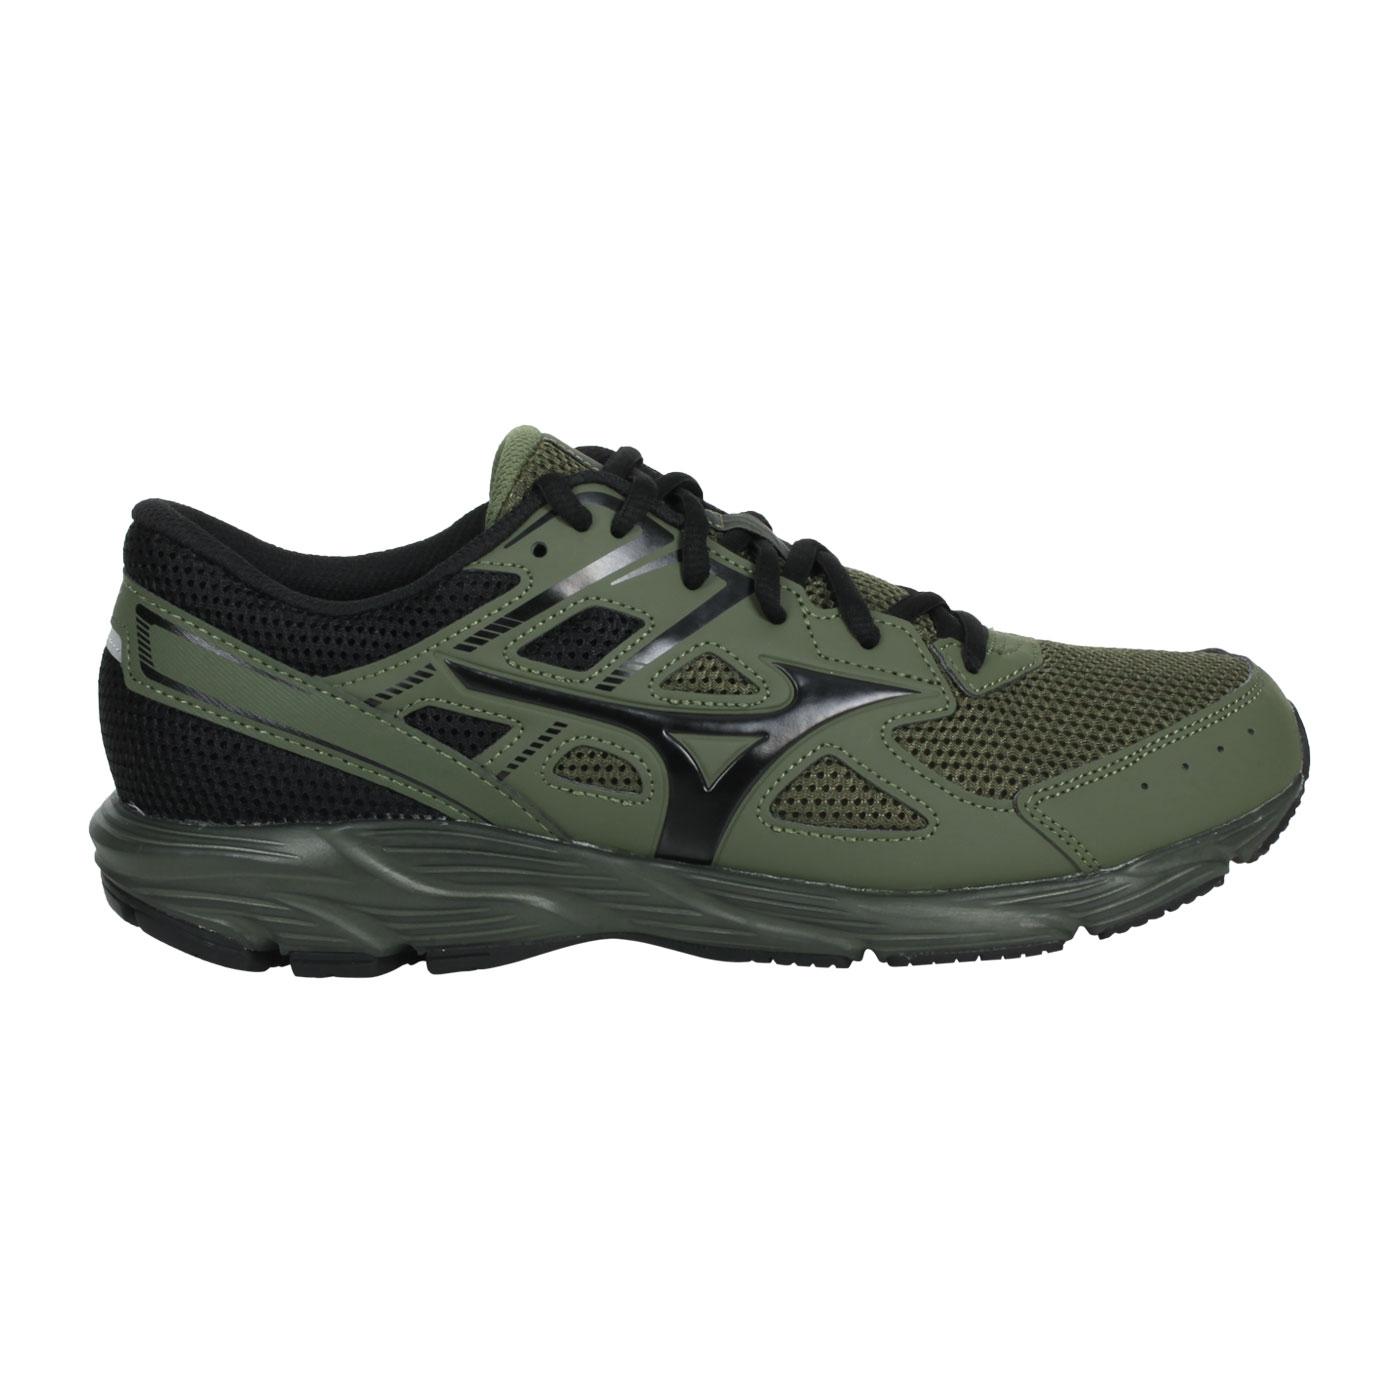 MIZUNO 男款慢跑鞋-WIDE  @MAXIMIZER 23@K1GA210086 - 軍綠黑